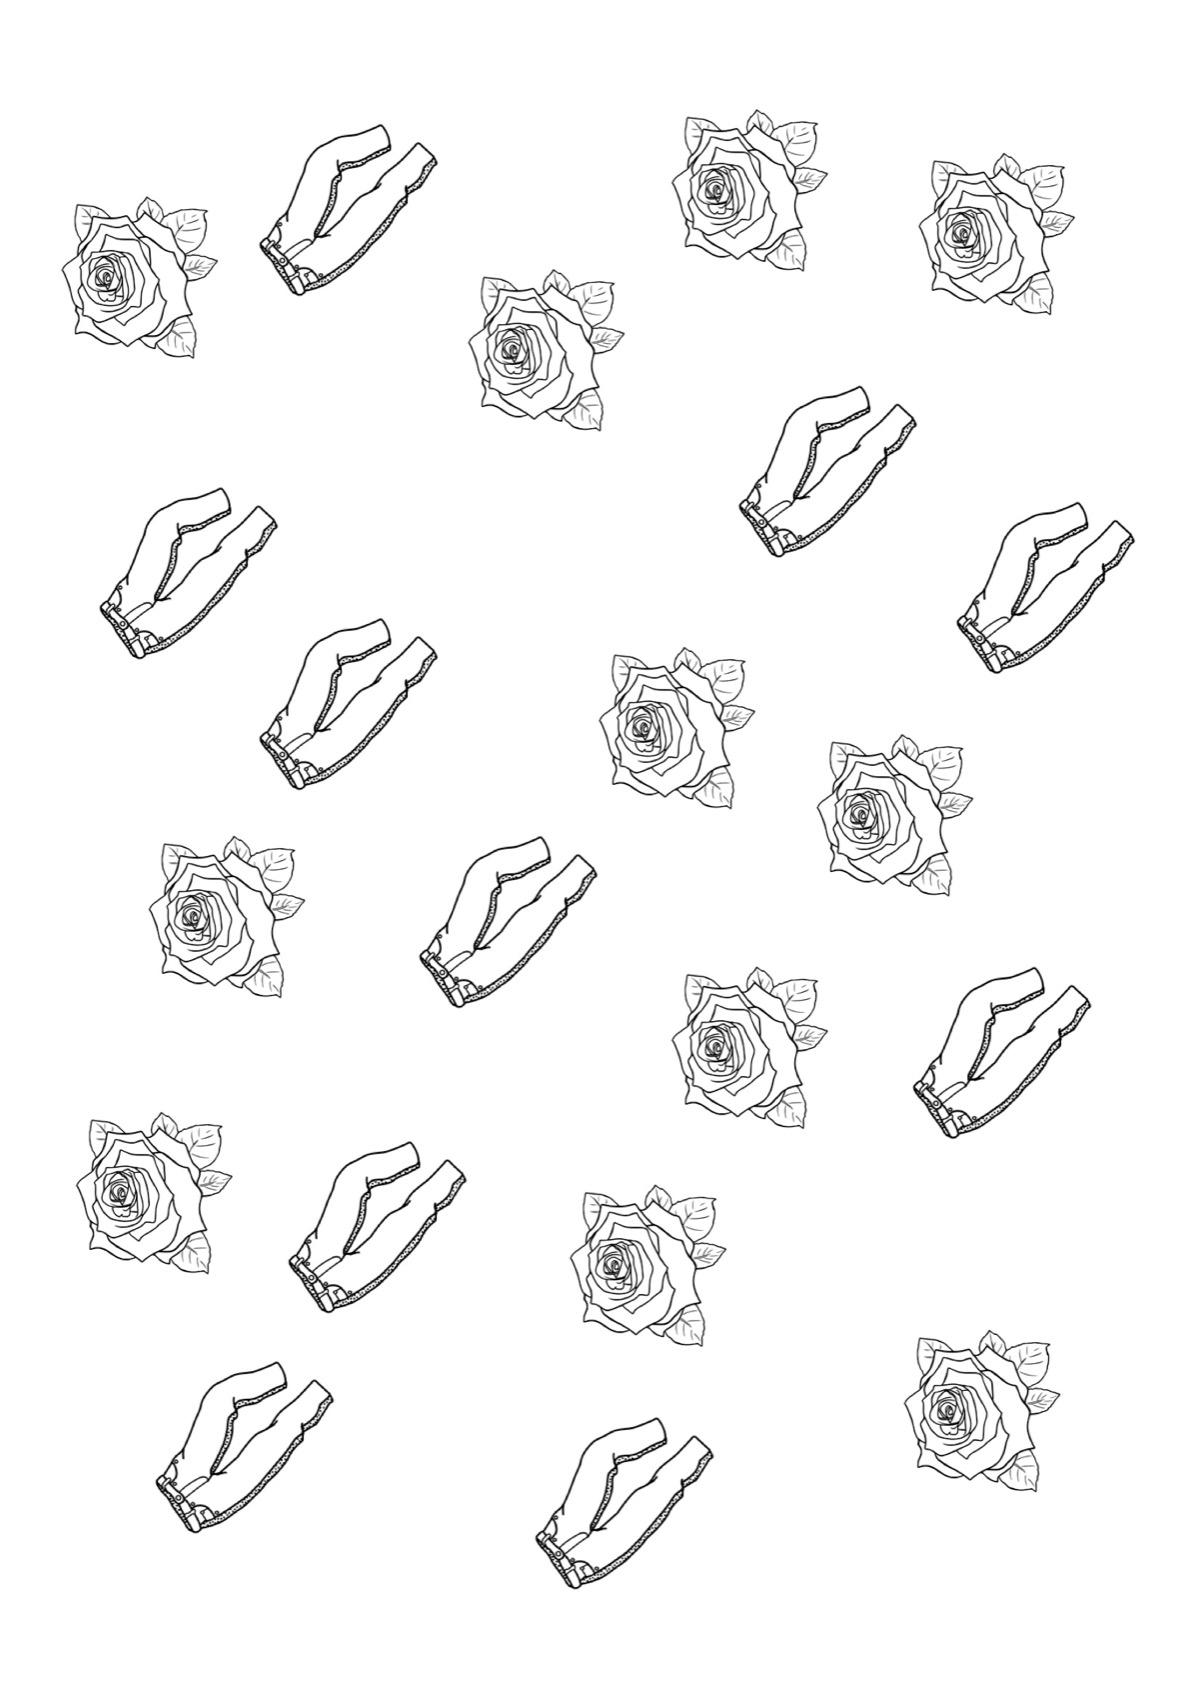 Sammlungen mit Minimalpaar Hose-Rose - Dyslalie - madoo.net